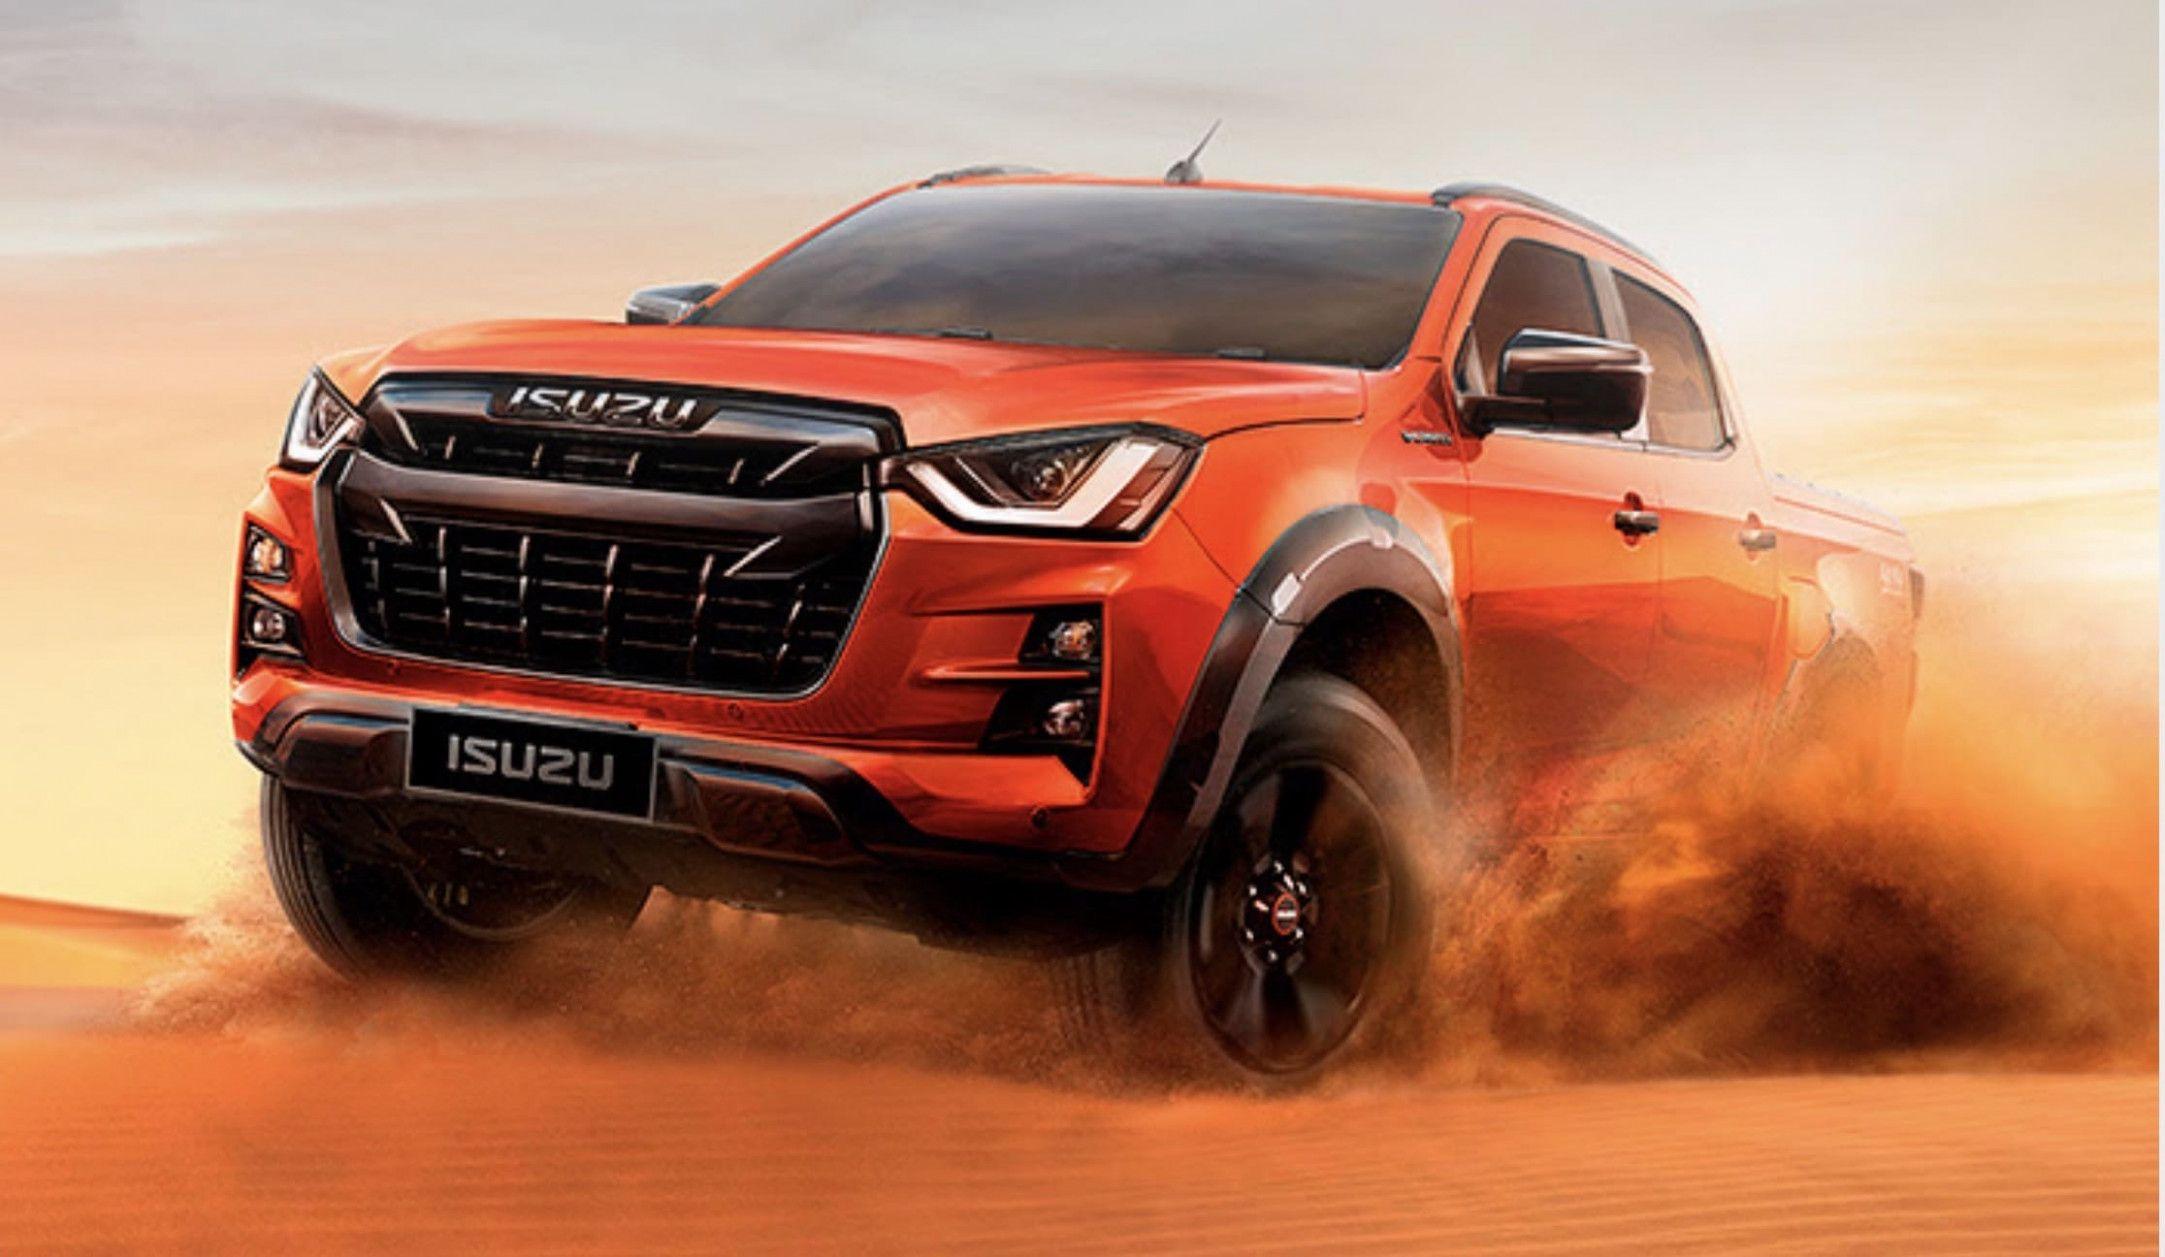 2020 Isuzu Pickup In 2020 Isuzu D Max Car Guys New Cars